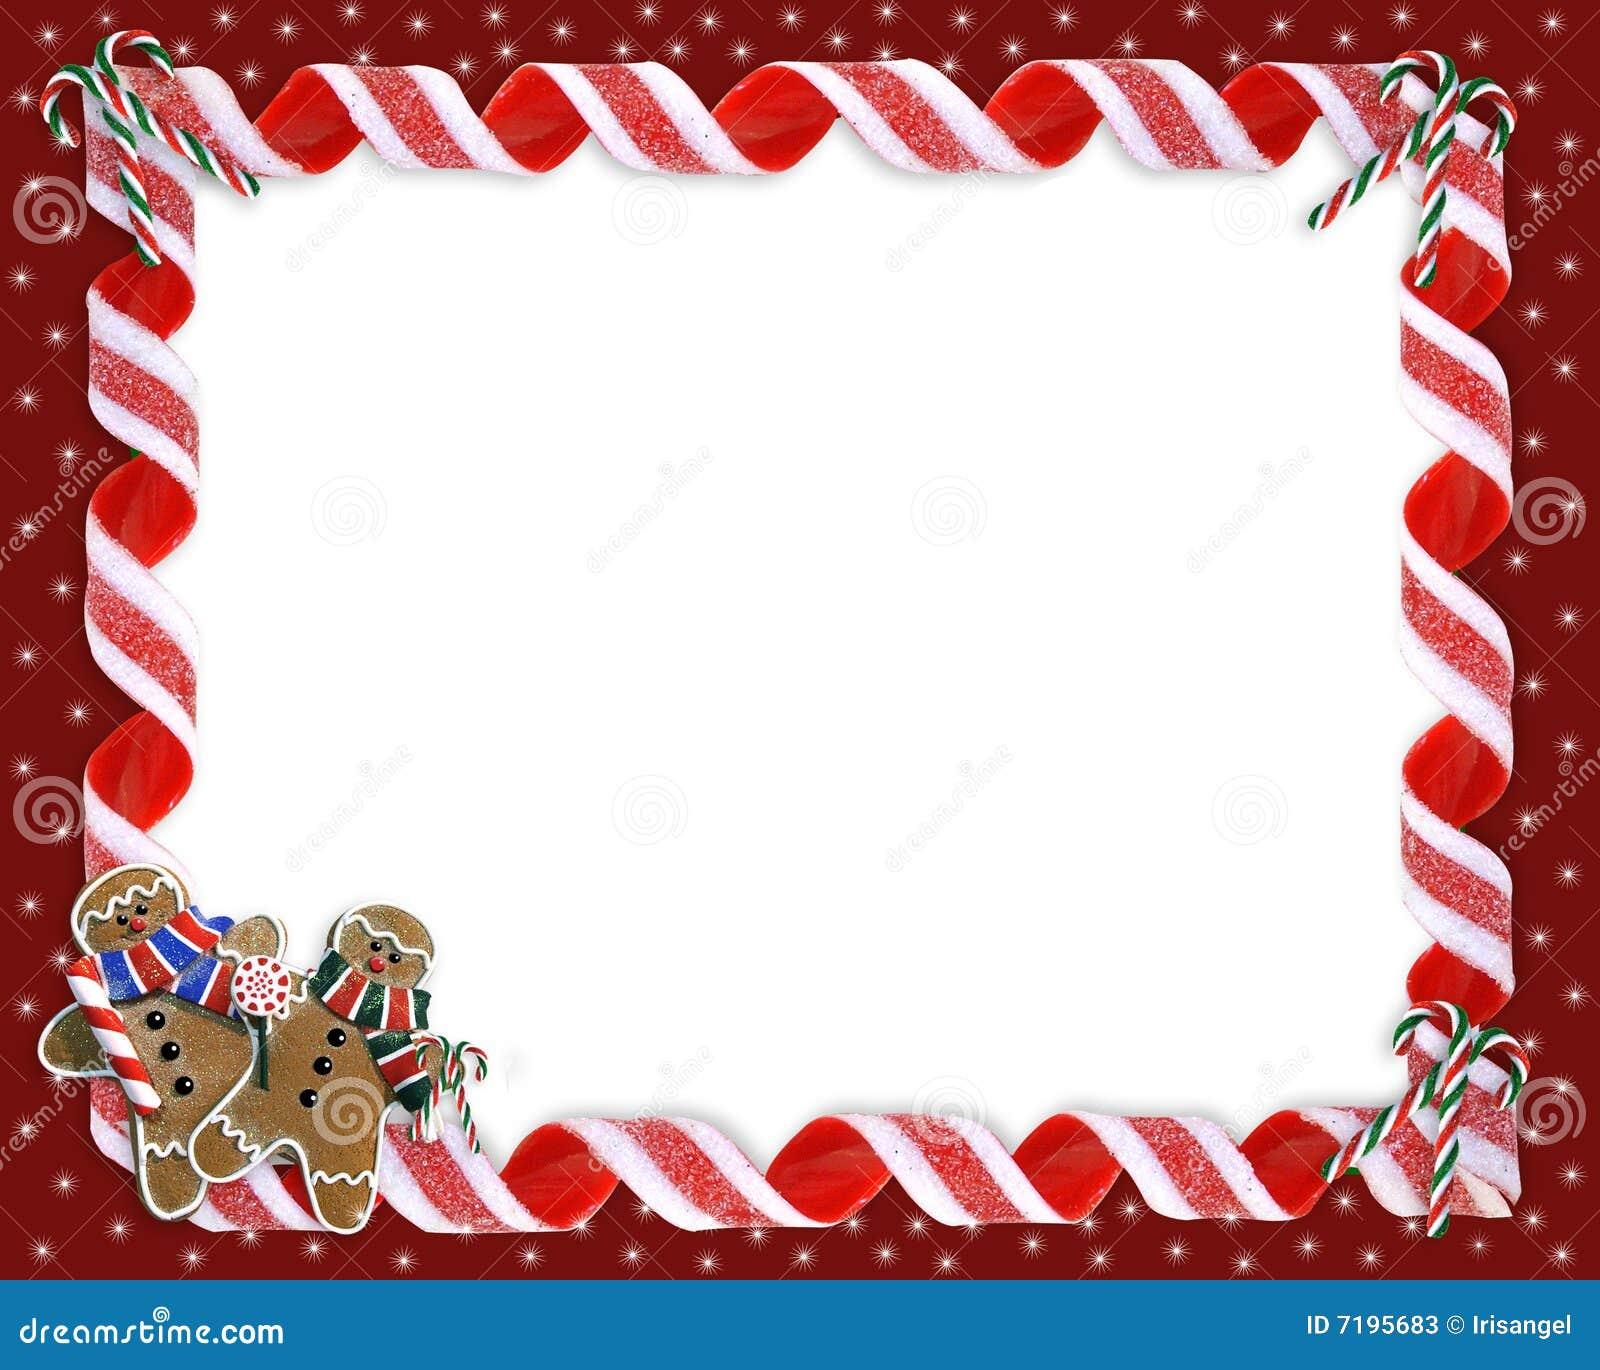 free christmas cookie borders clip art - photo #26